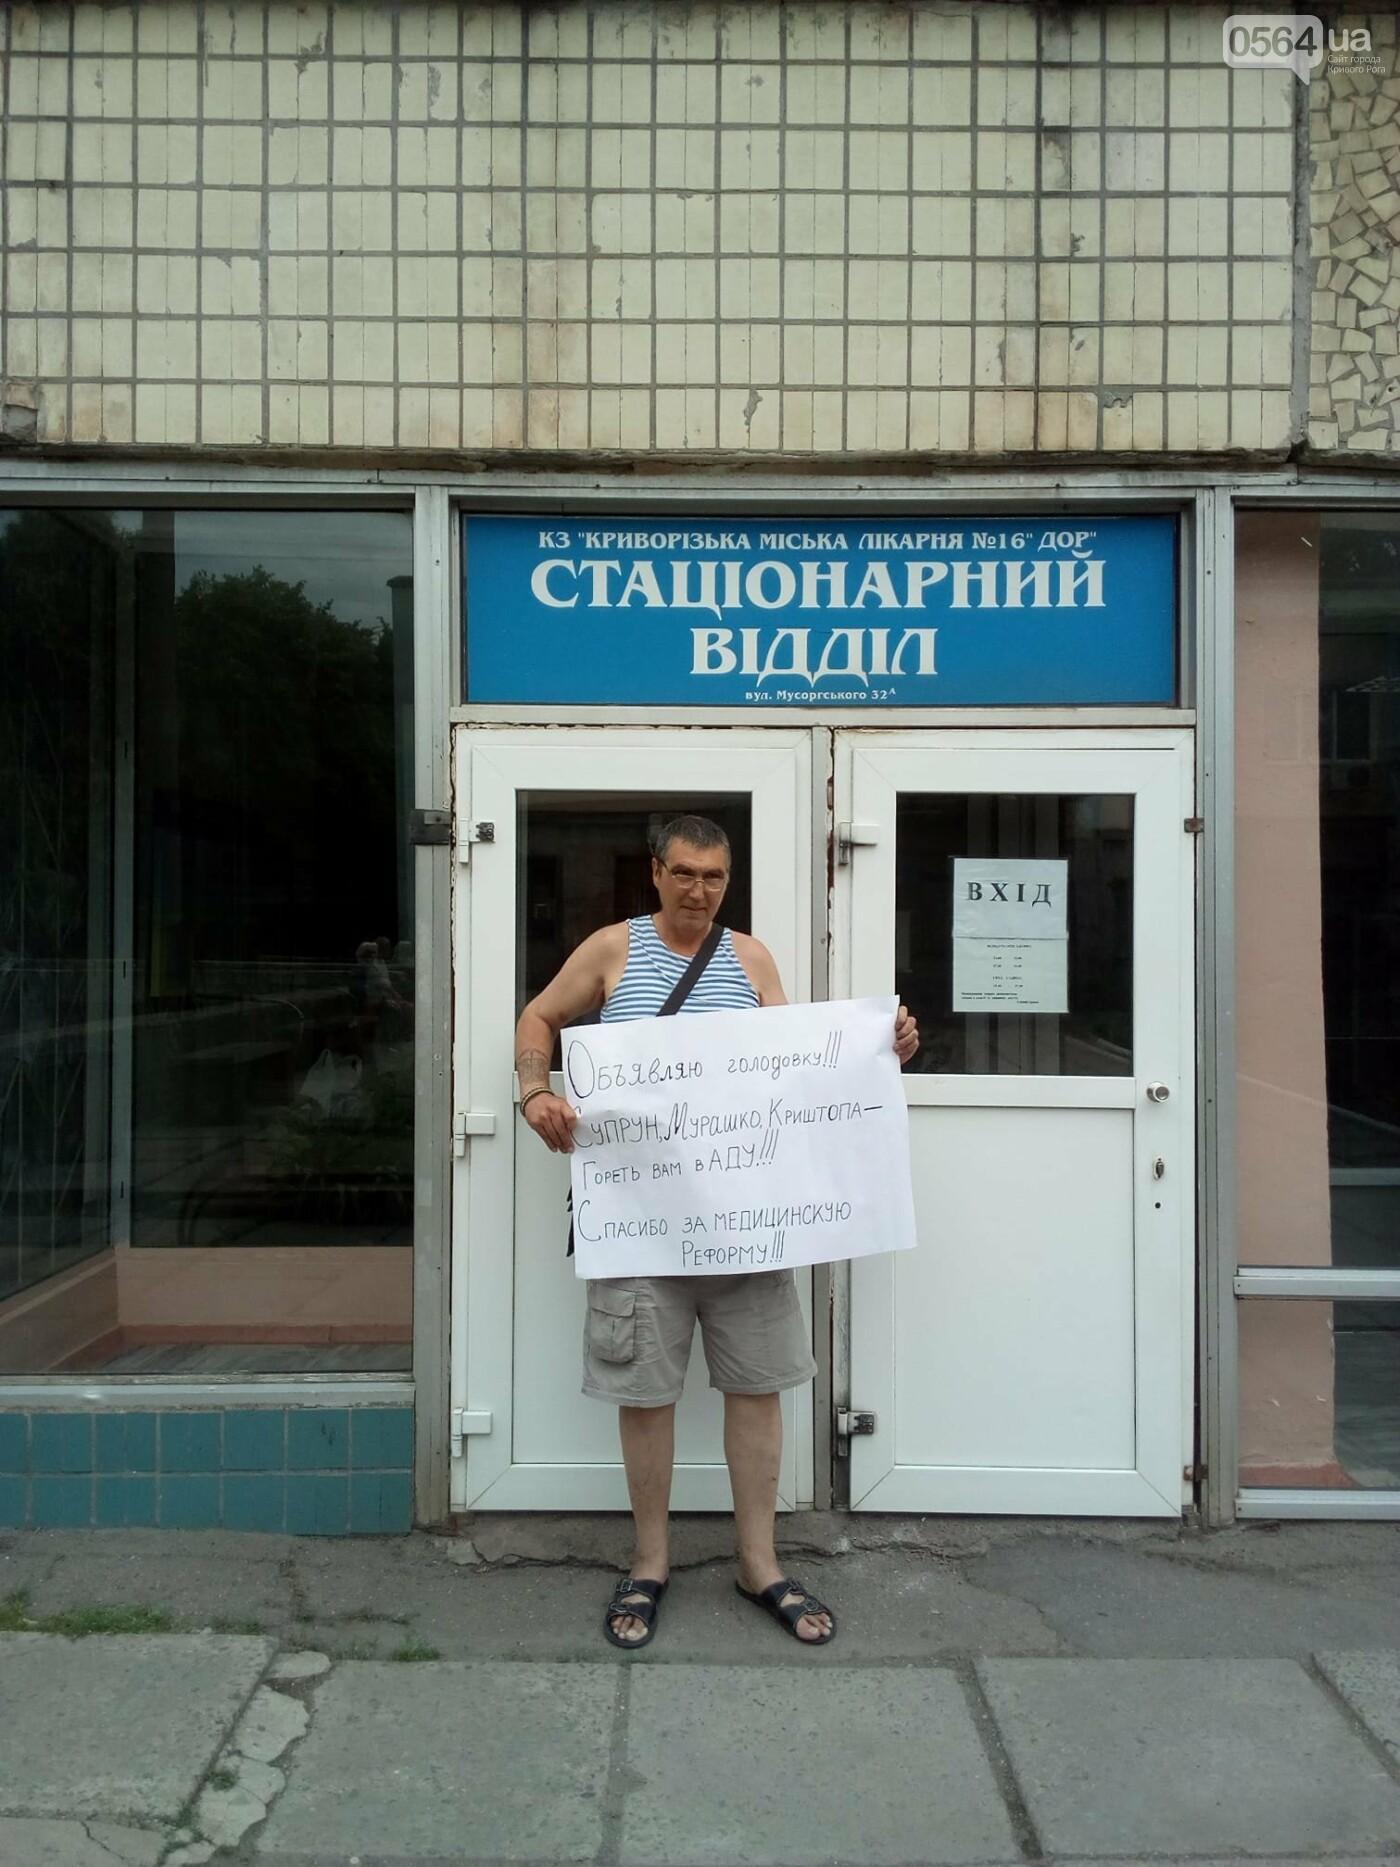 В Кривом Роге участник АТО объявил голодовку, - ФОТО, фото-2